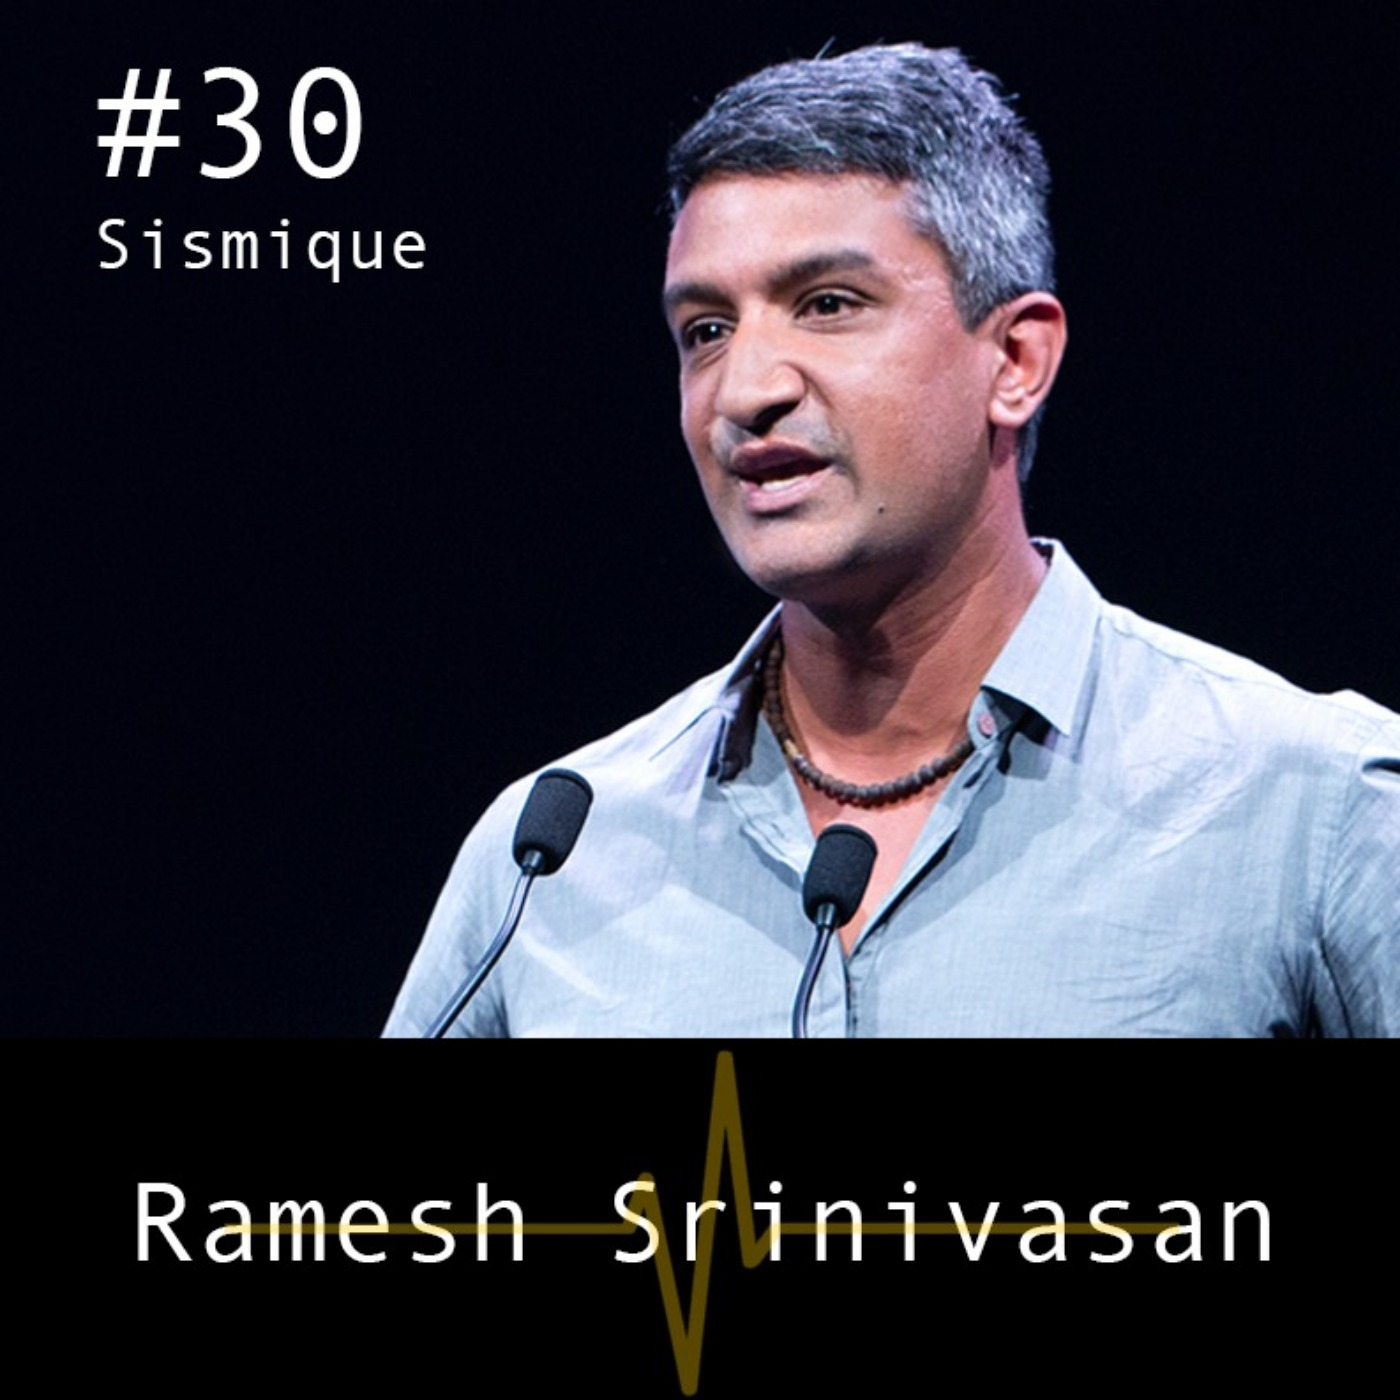 🇬🇧Rethinking how technology shapes the world - Ramesh Srinivasan